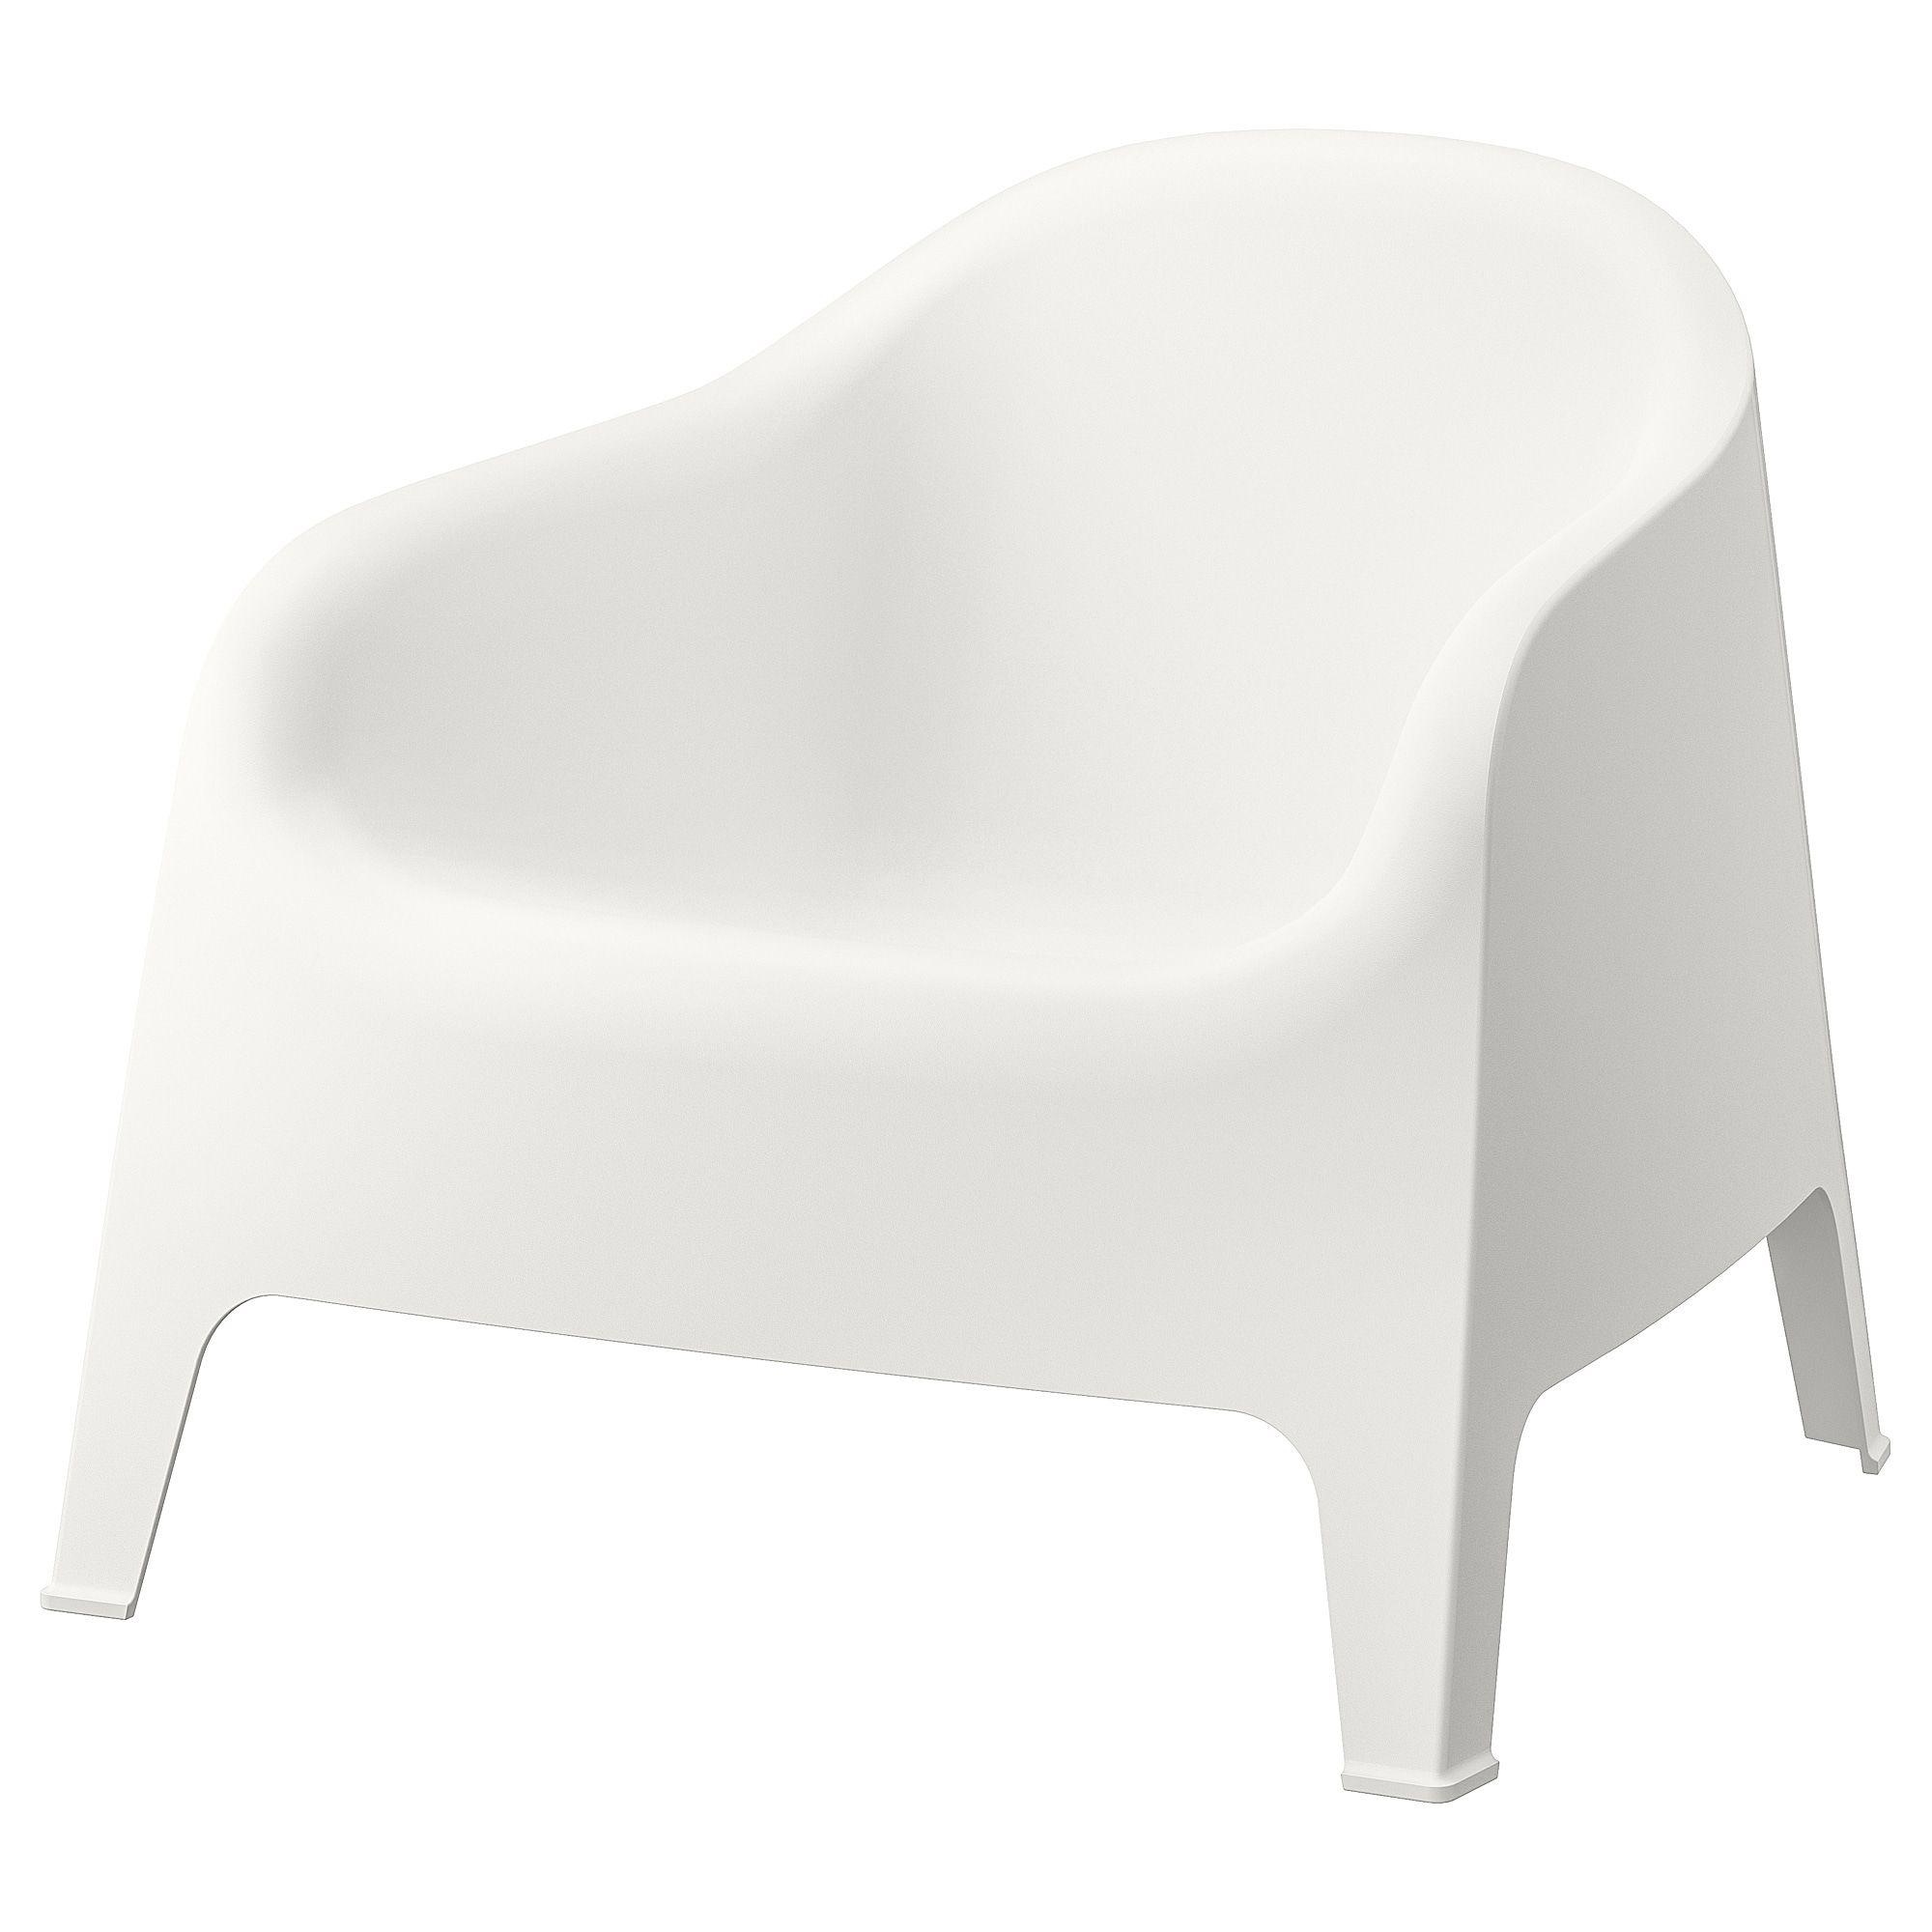 Ikea Skarpo White Armchair, Outdoor   Ikea Garden Furniture ... intérieur Transat Jardin Ikea